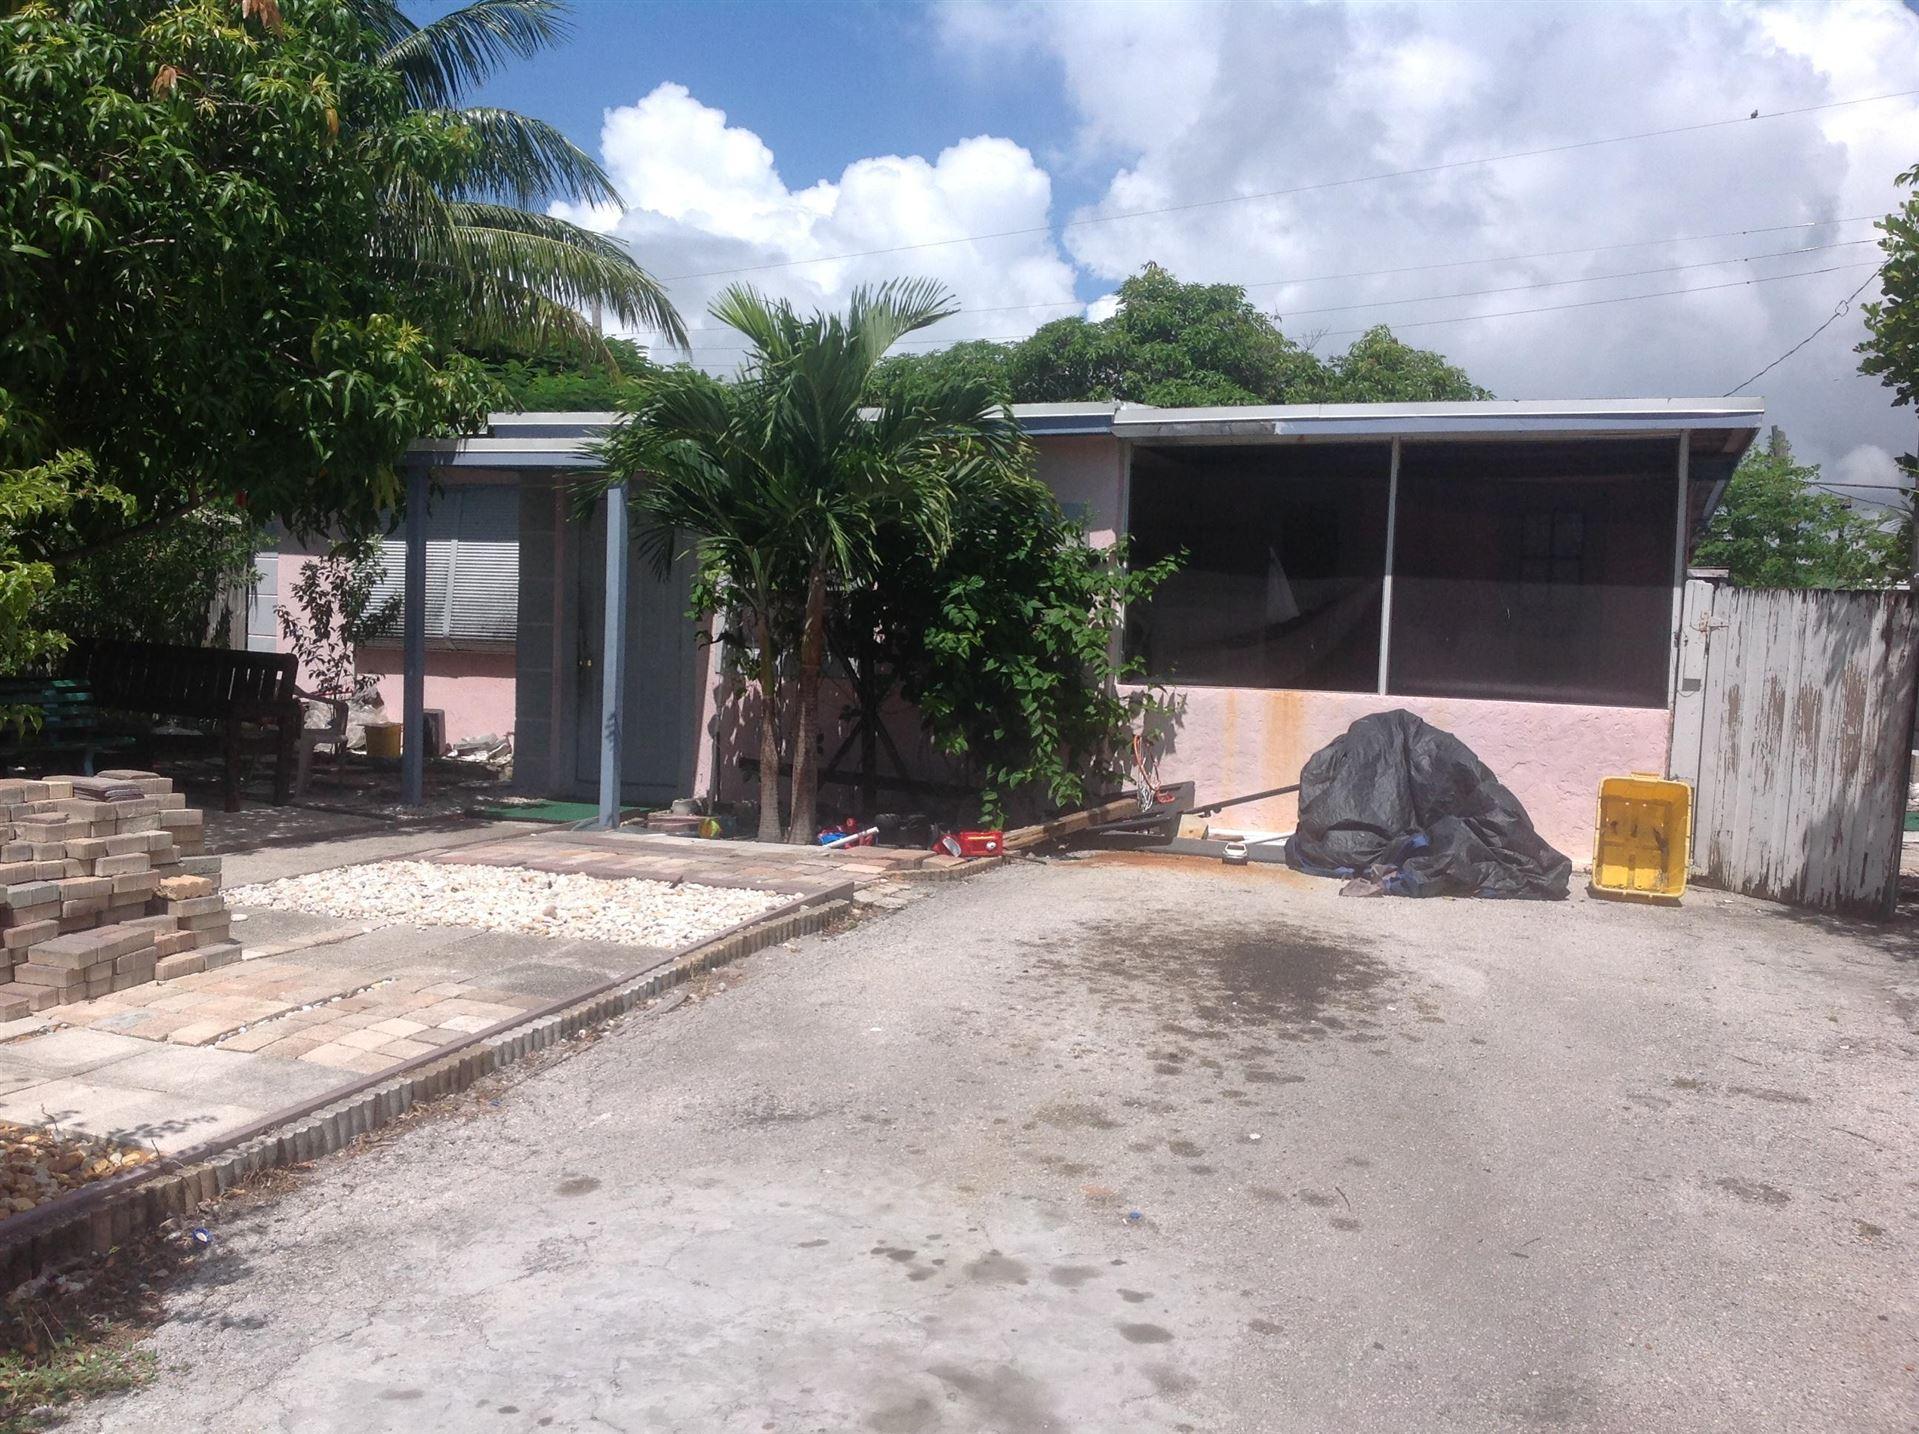 391 Hibiscus Tree Drive, Lantana, FL 33462 - #: RX-10650310